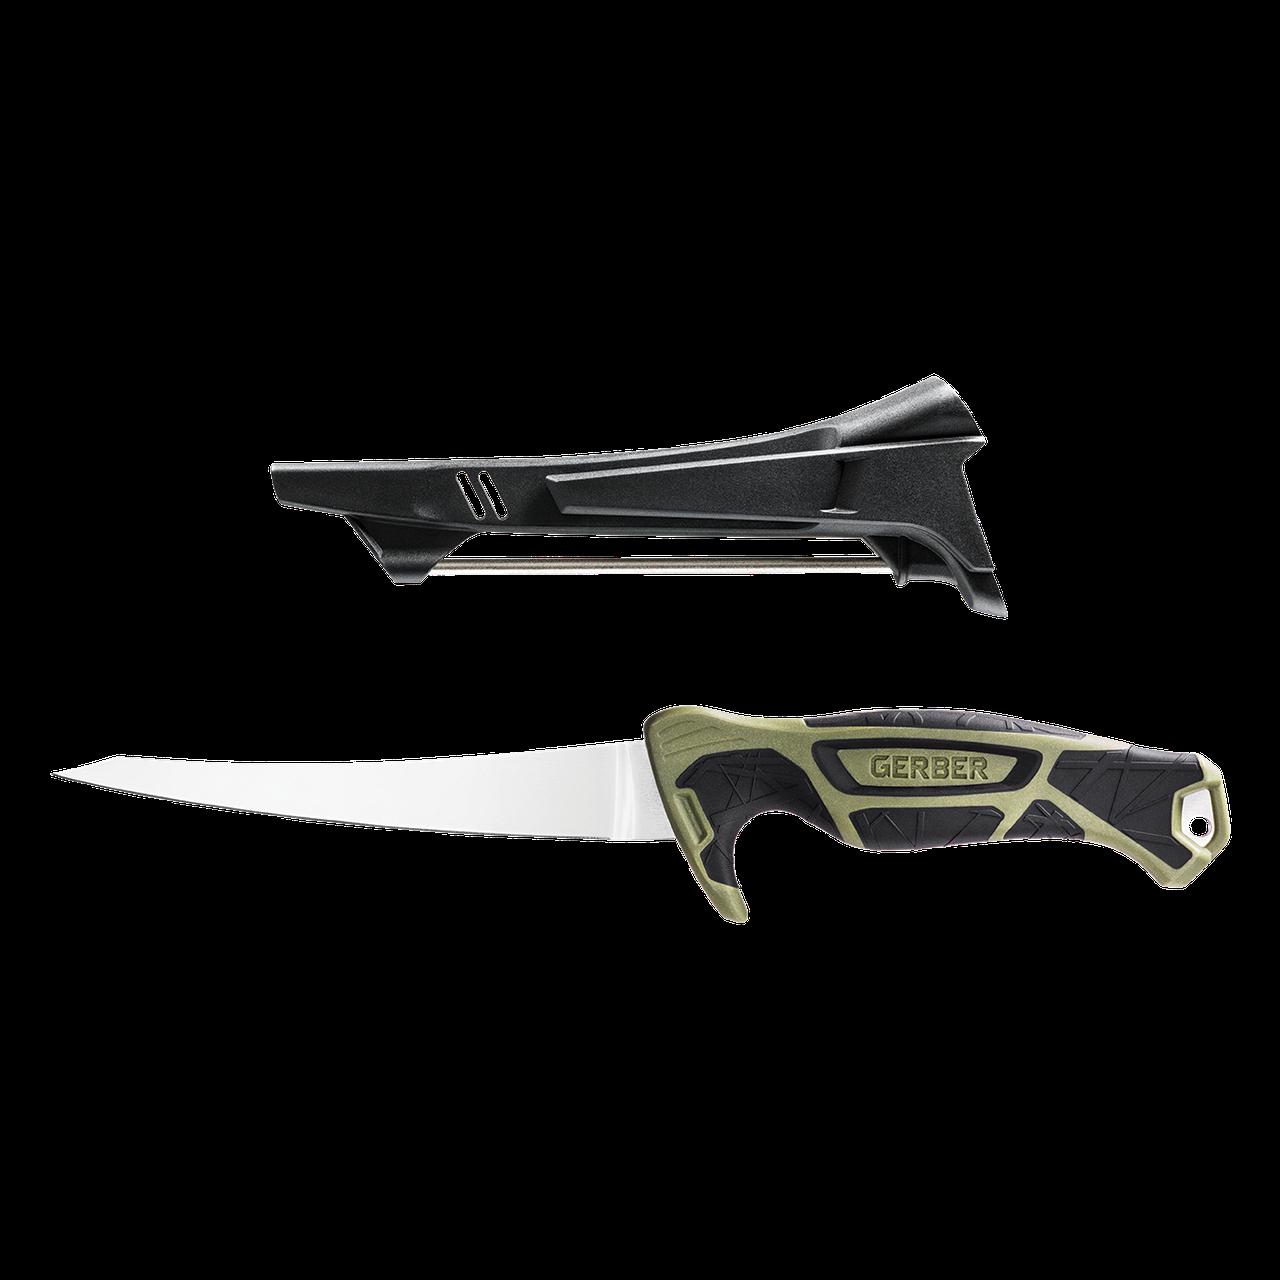 Нож Gerber Controller 8 Fillet Knife